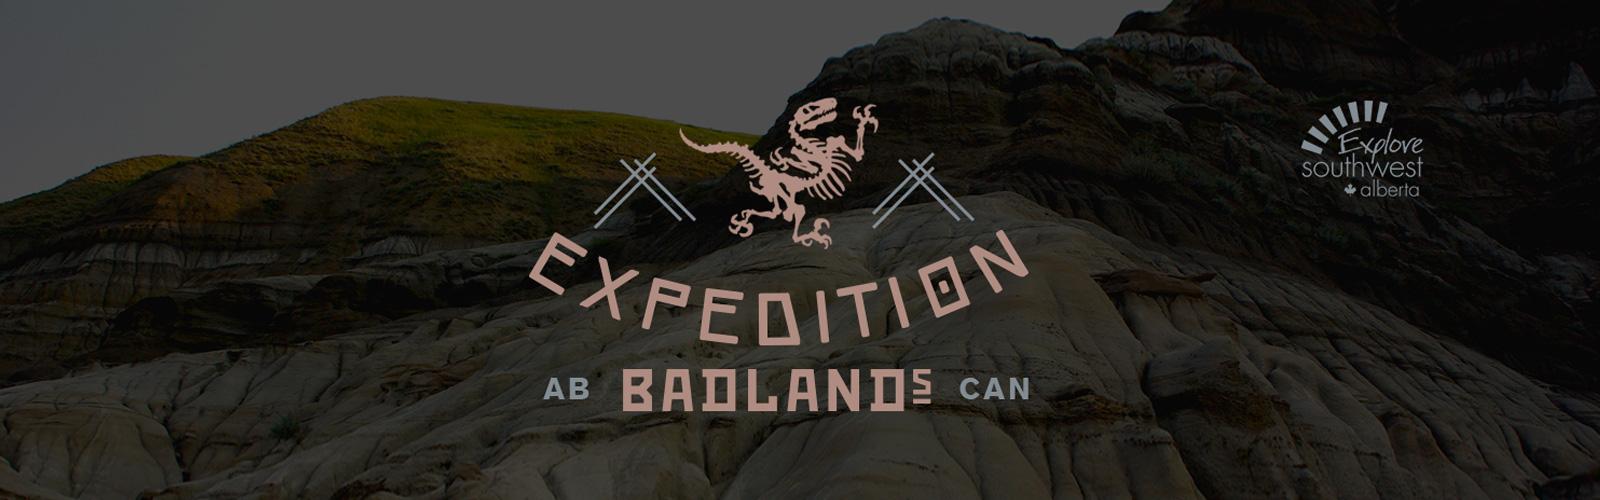 Expedition: Badlands